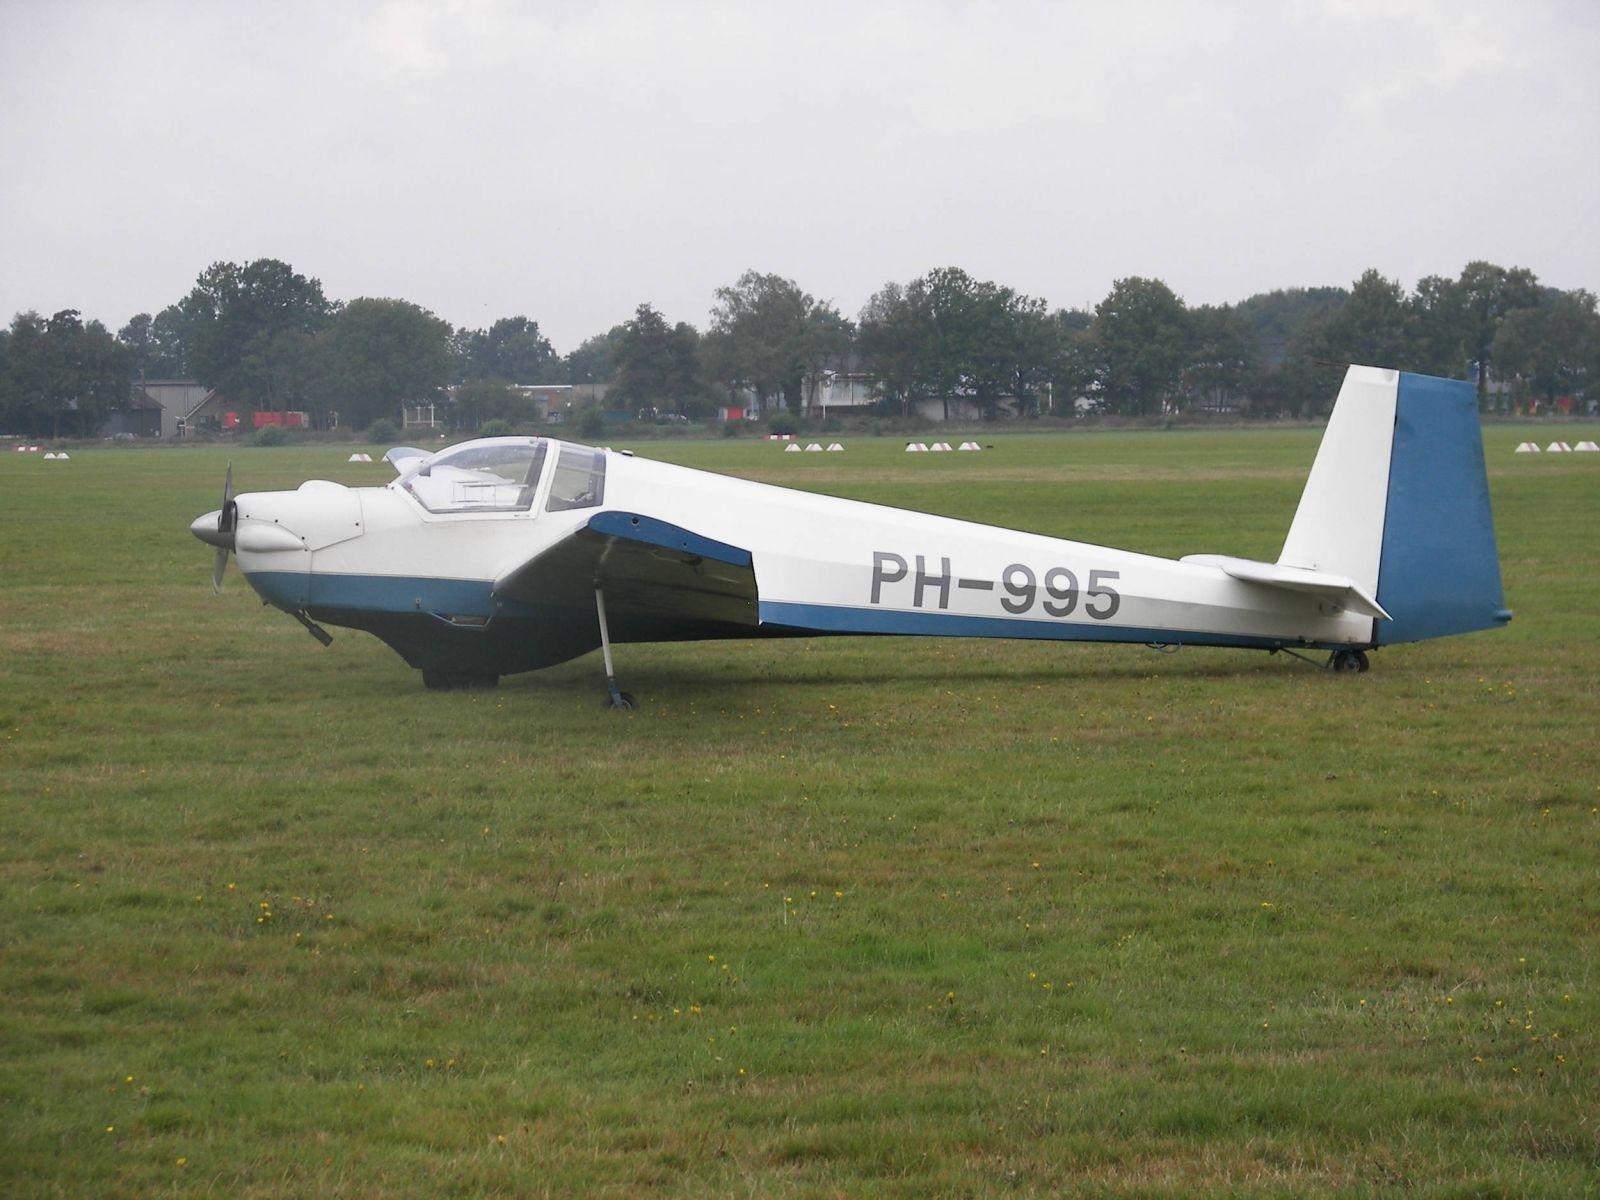 28-09-2012 EHHV (Hilversum, The Netherlands)